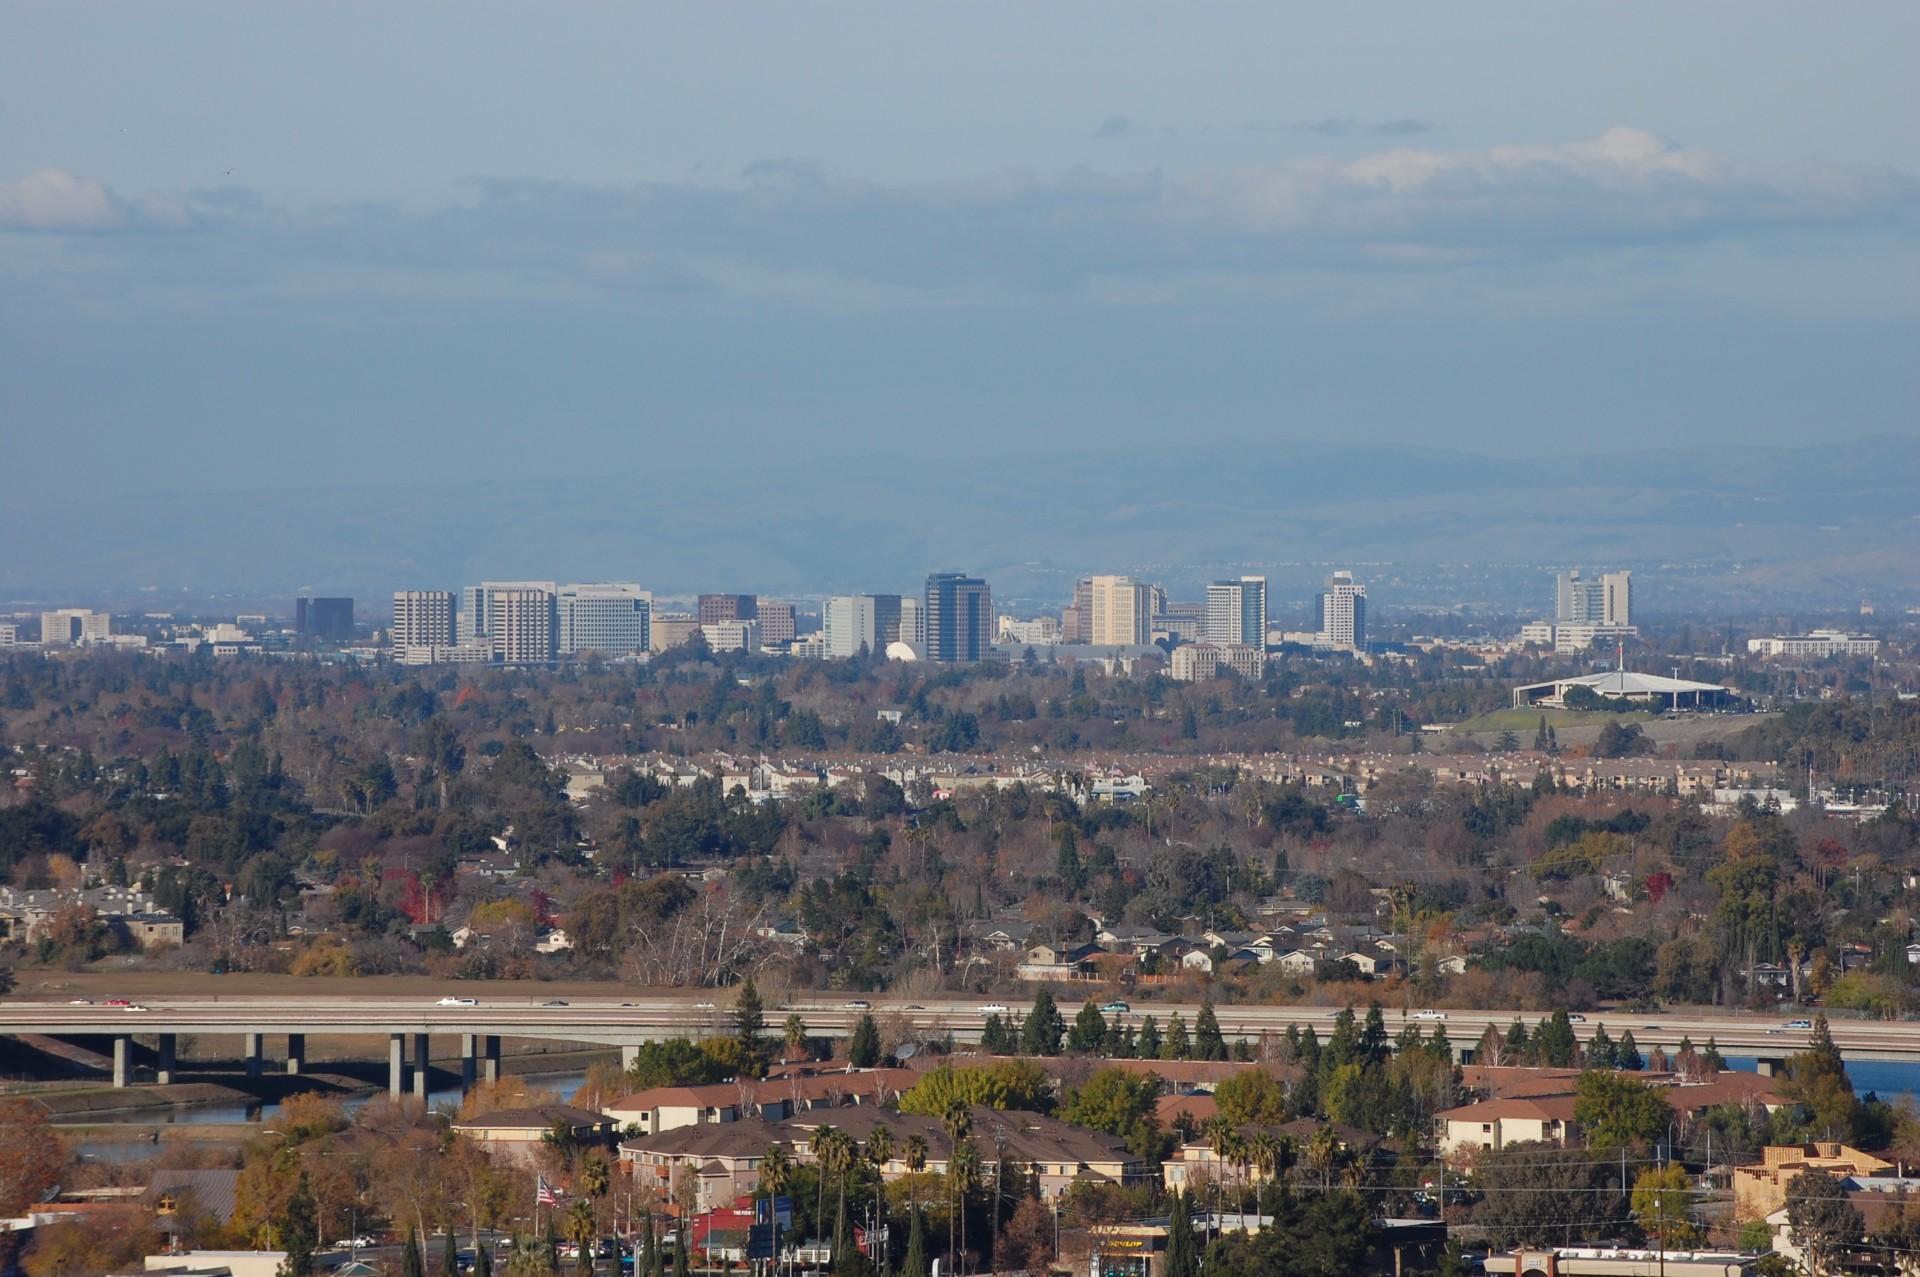 San Jose Population in 2017